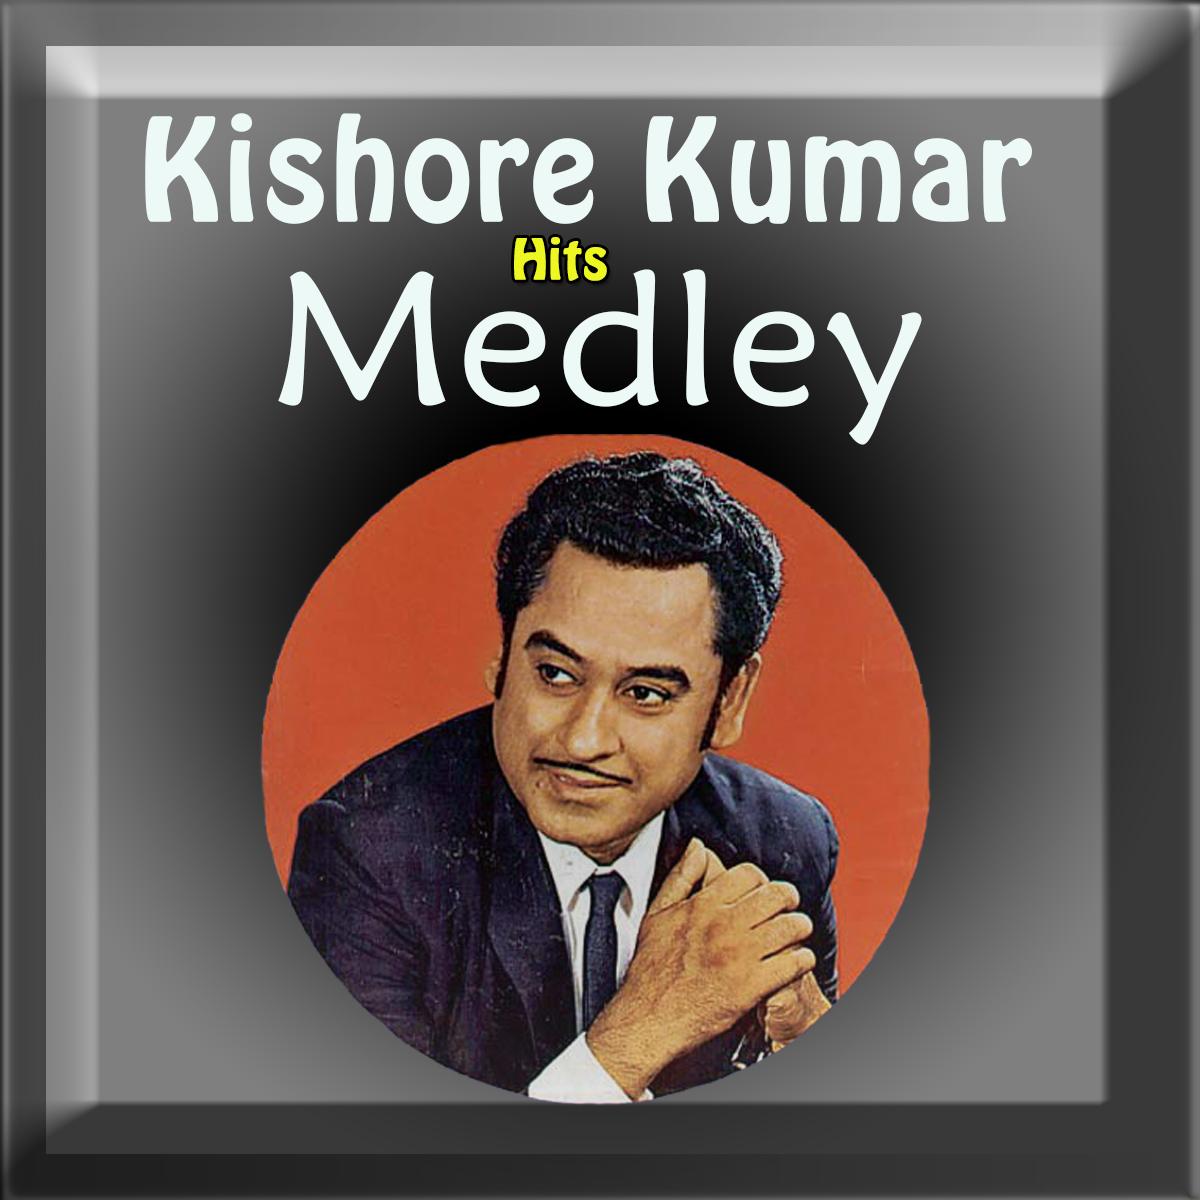 pin kishore kumar of bhigi rato mein mp3 download on pinterest